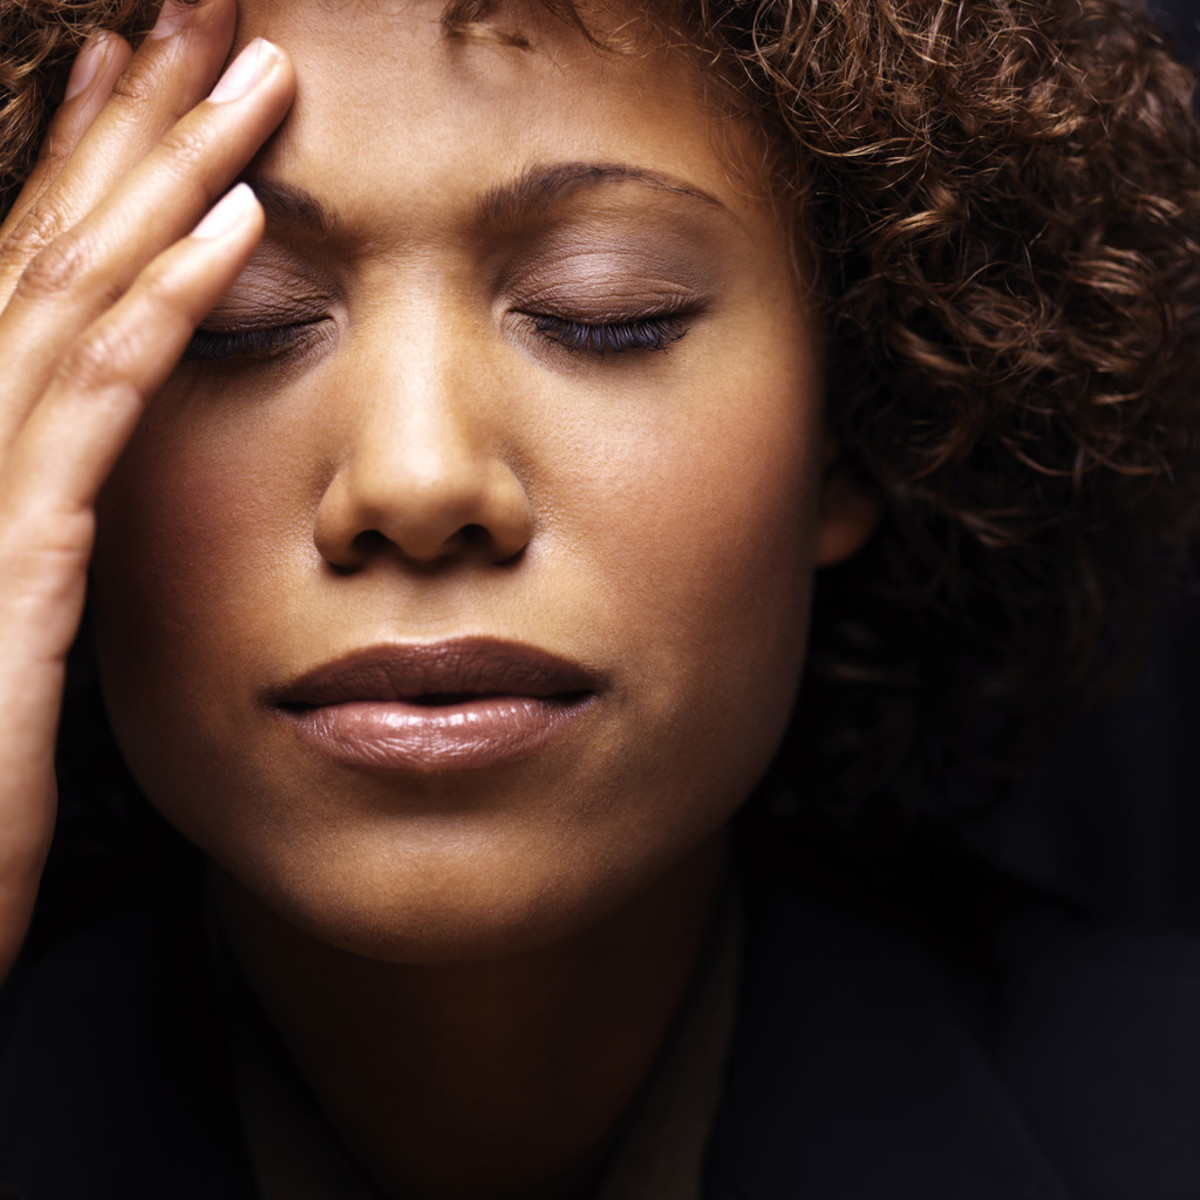 Headaches - Minor disorders of pregnancy